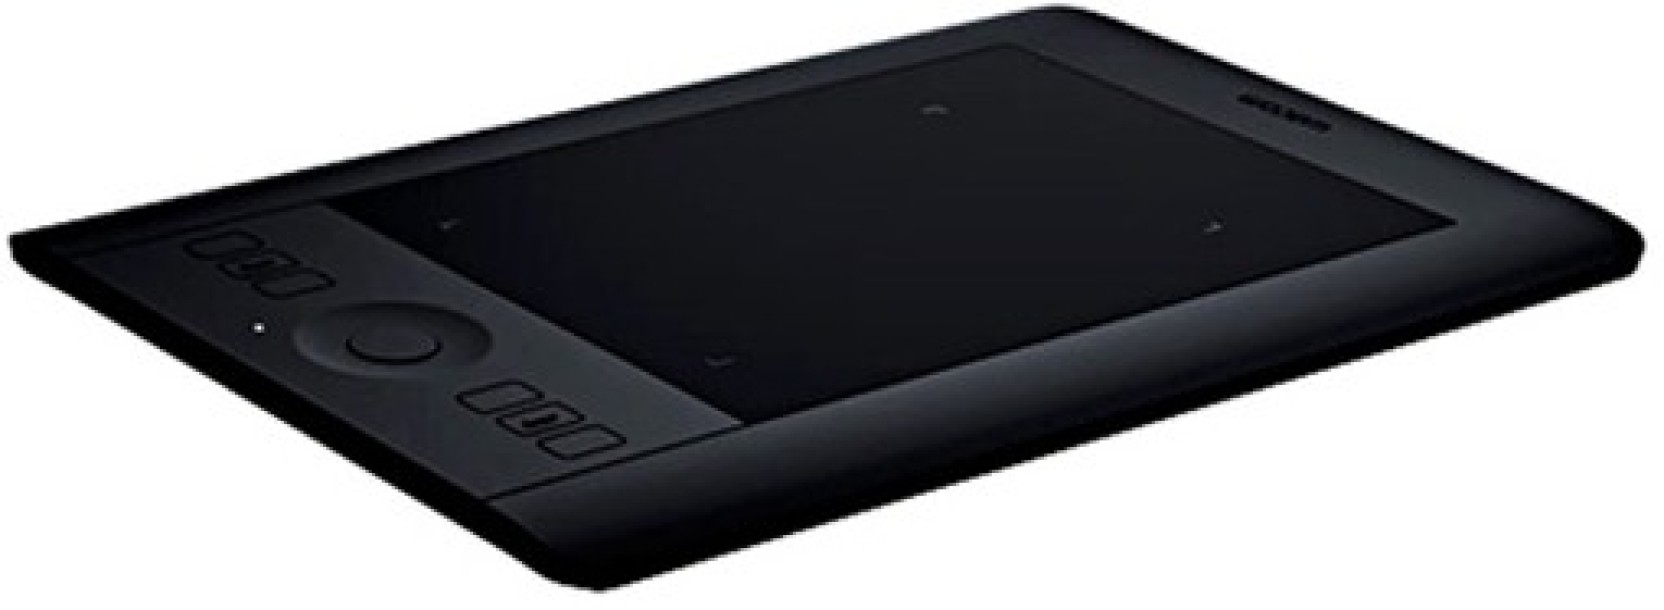 WACOM PTH-451 Intuos Pro Small Tablet 25 x 8 4 inch Graphics